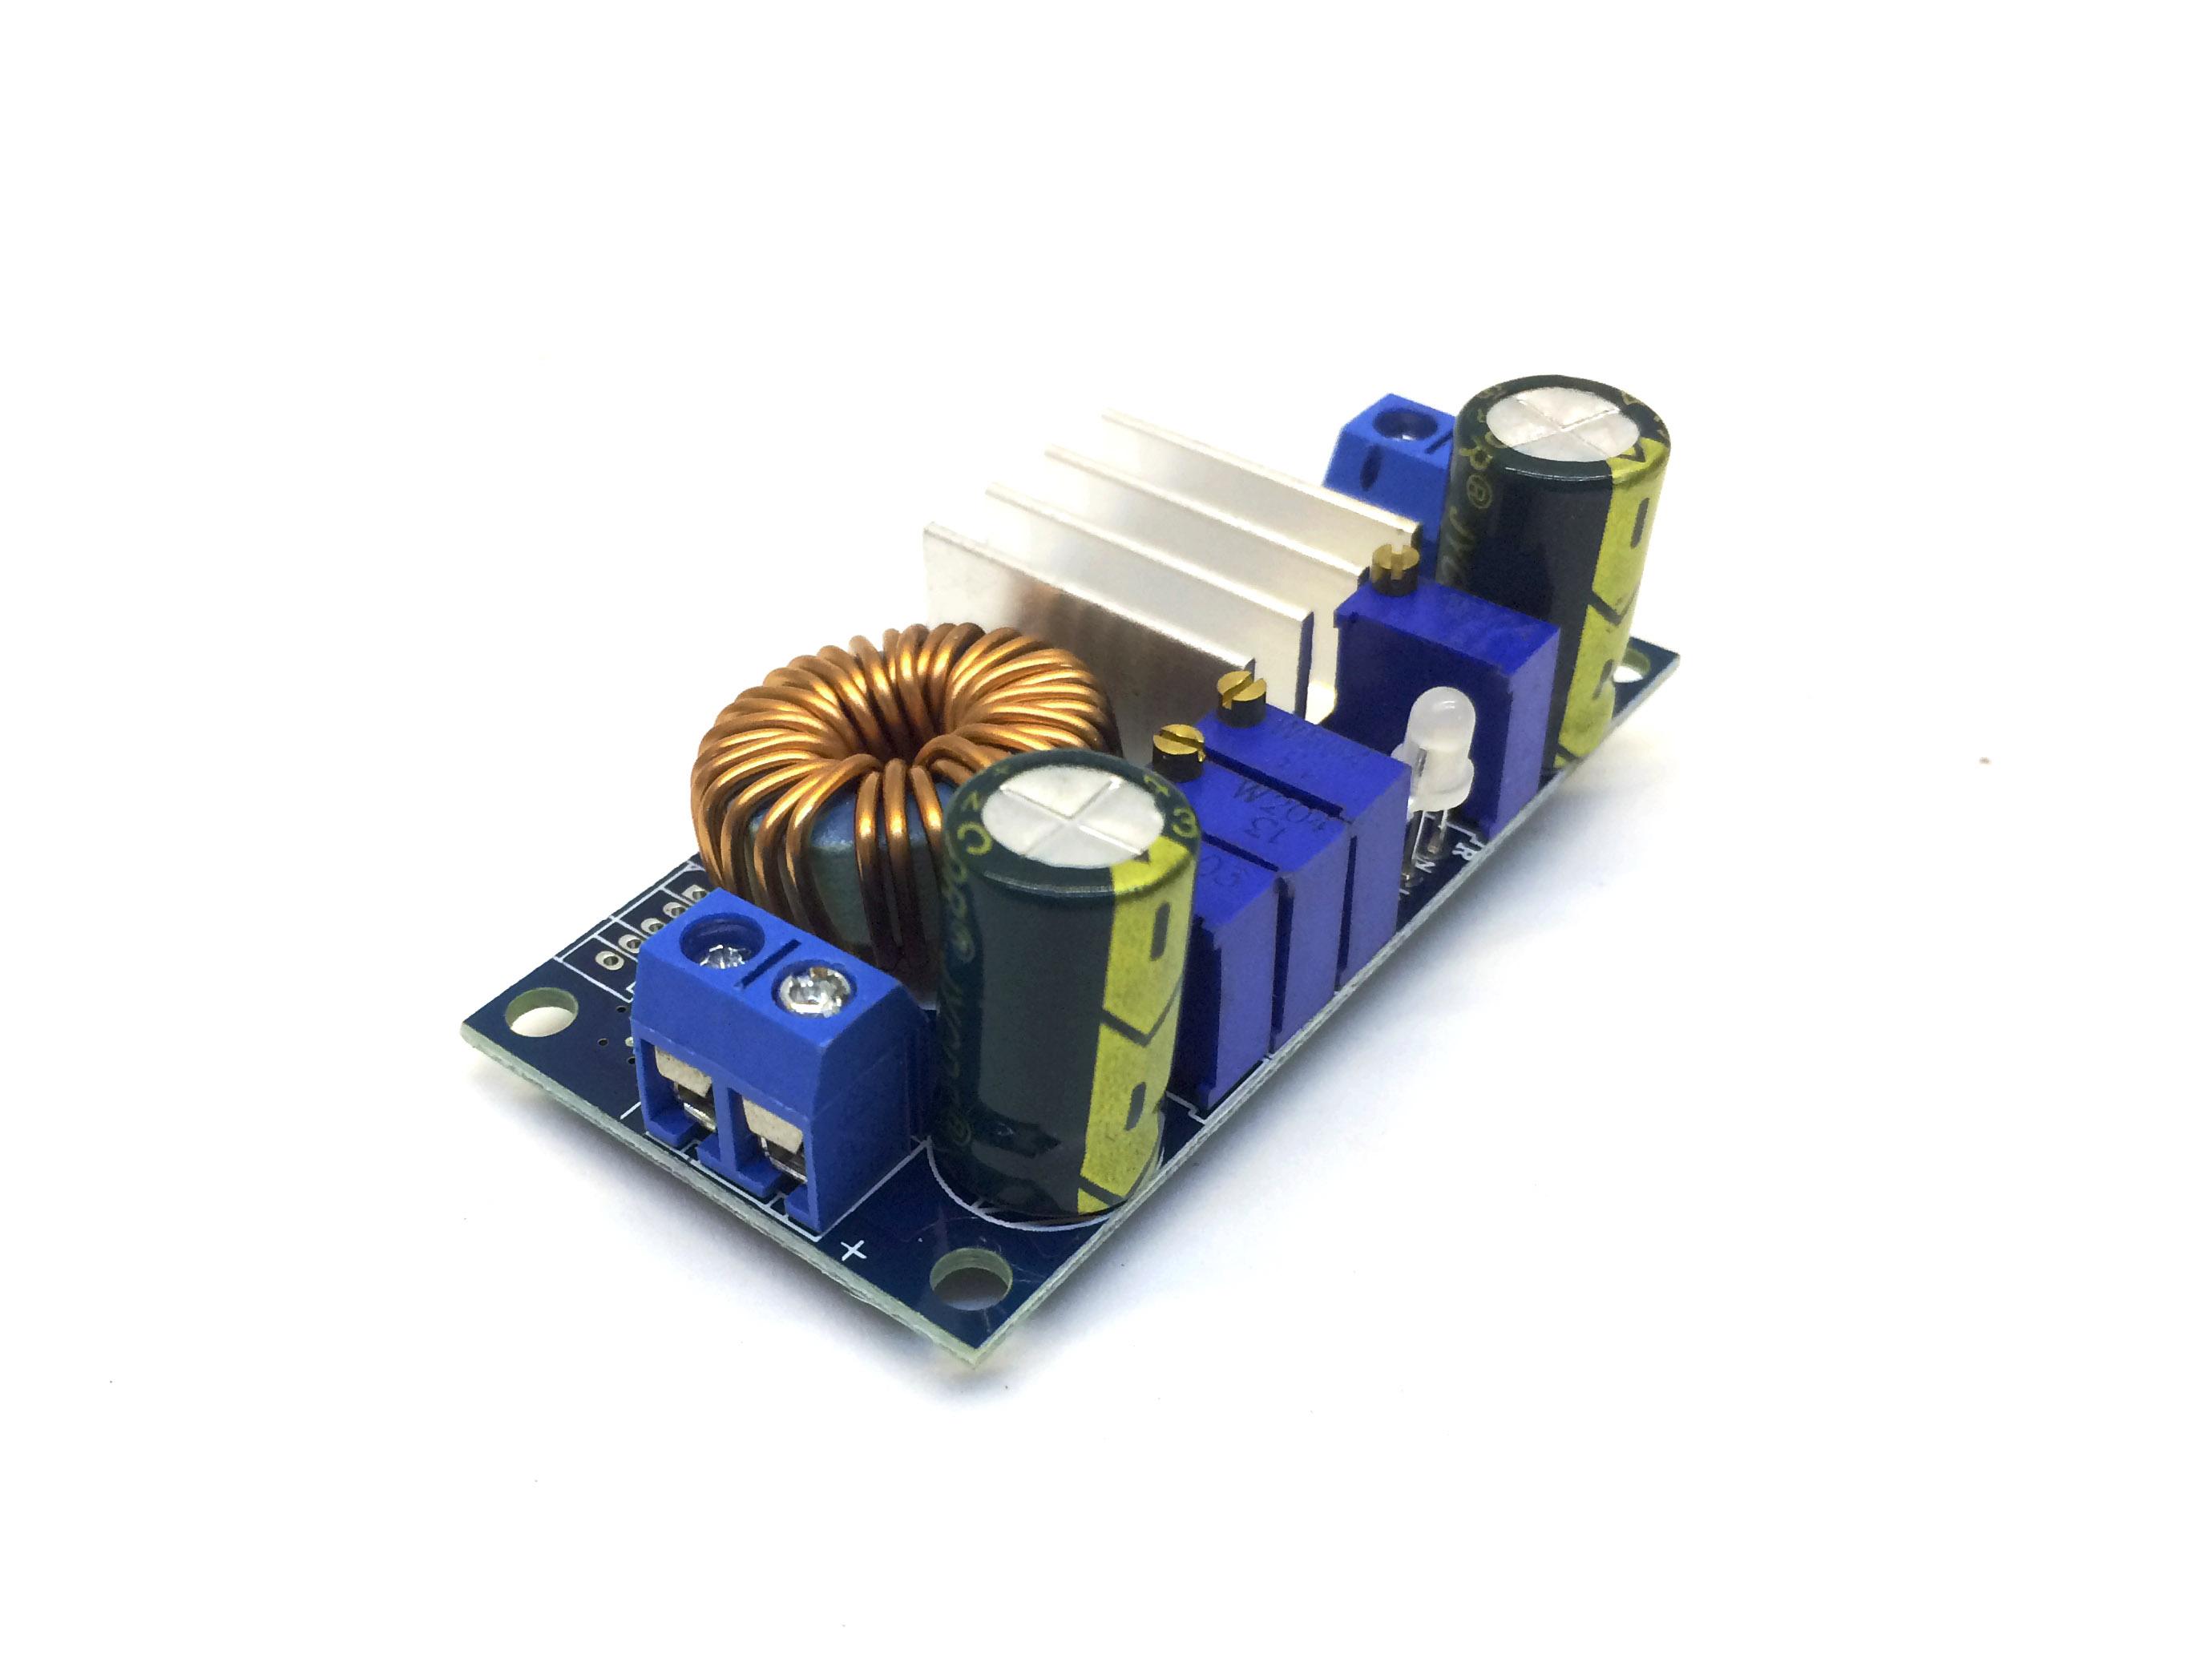 Mạch sạc ắc quy 5A từ pin mặt trời